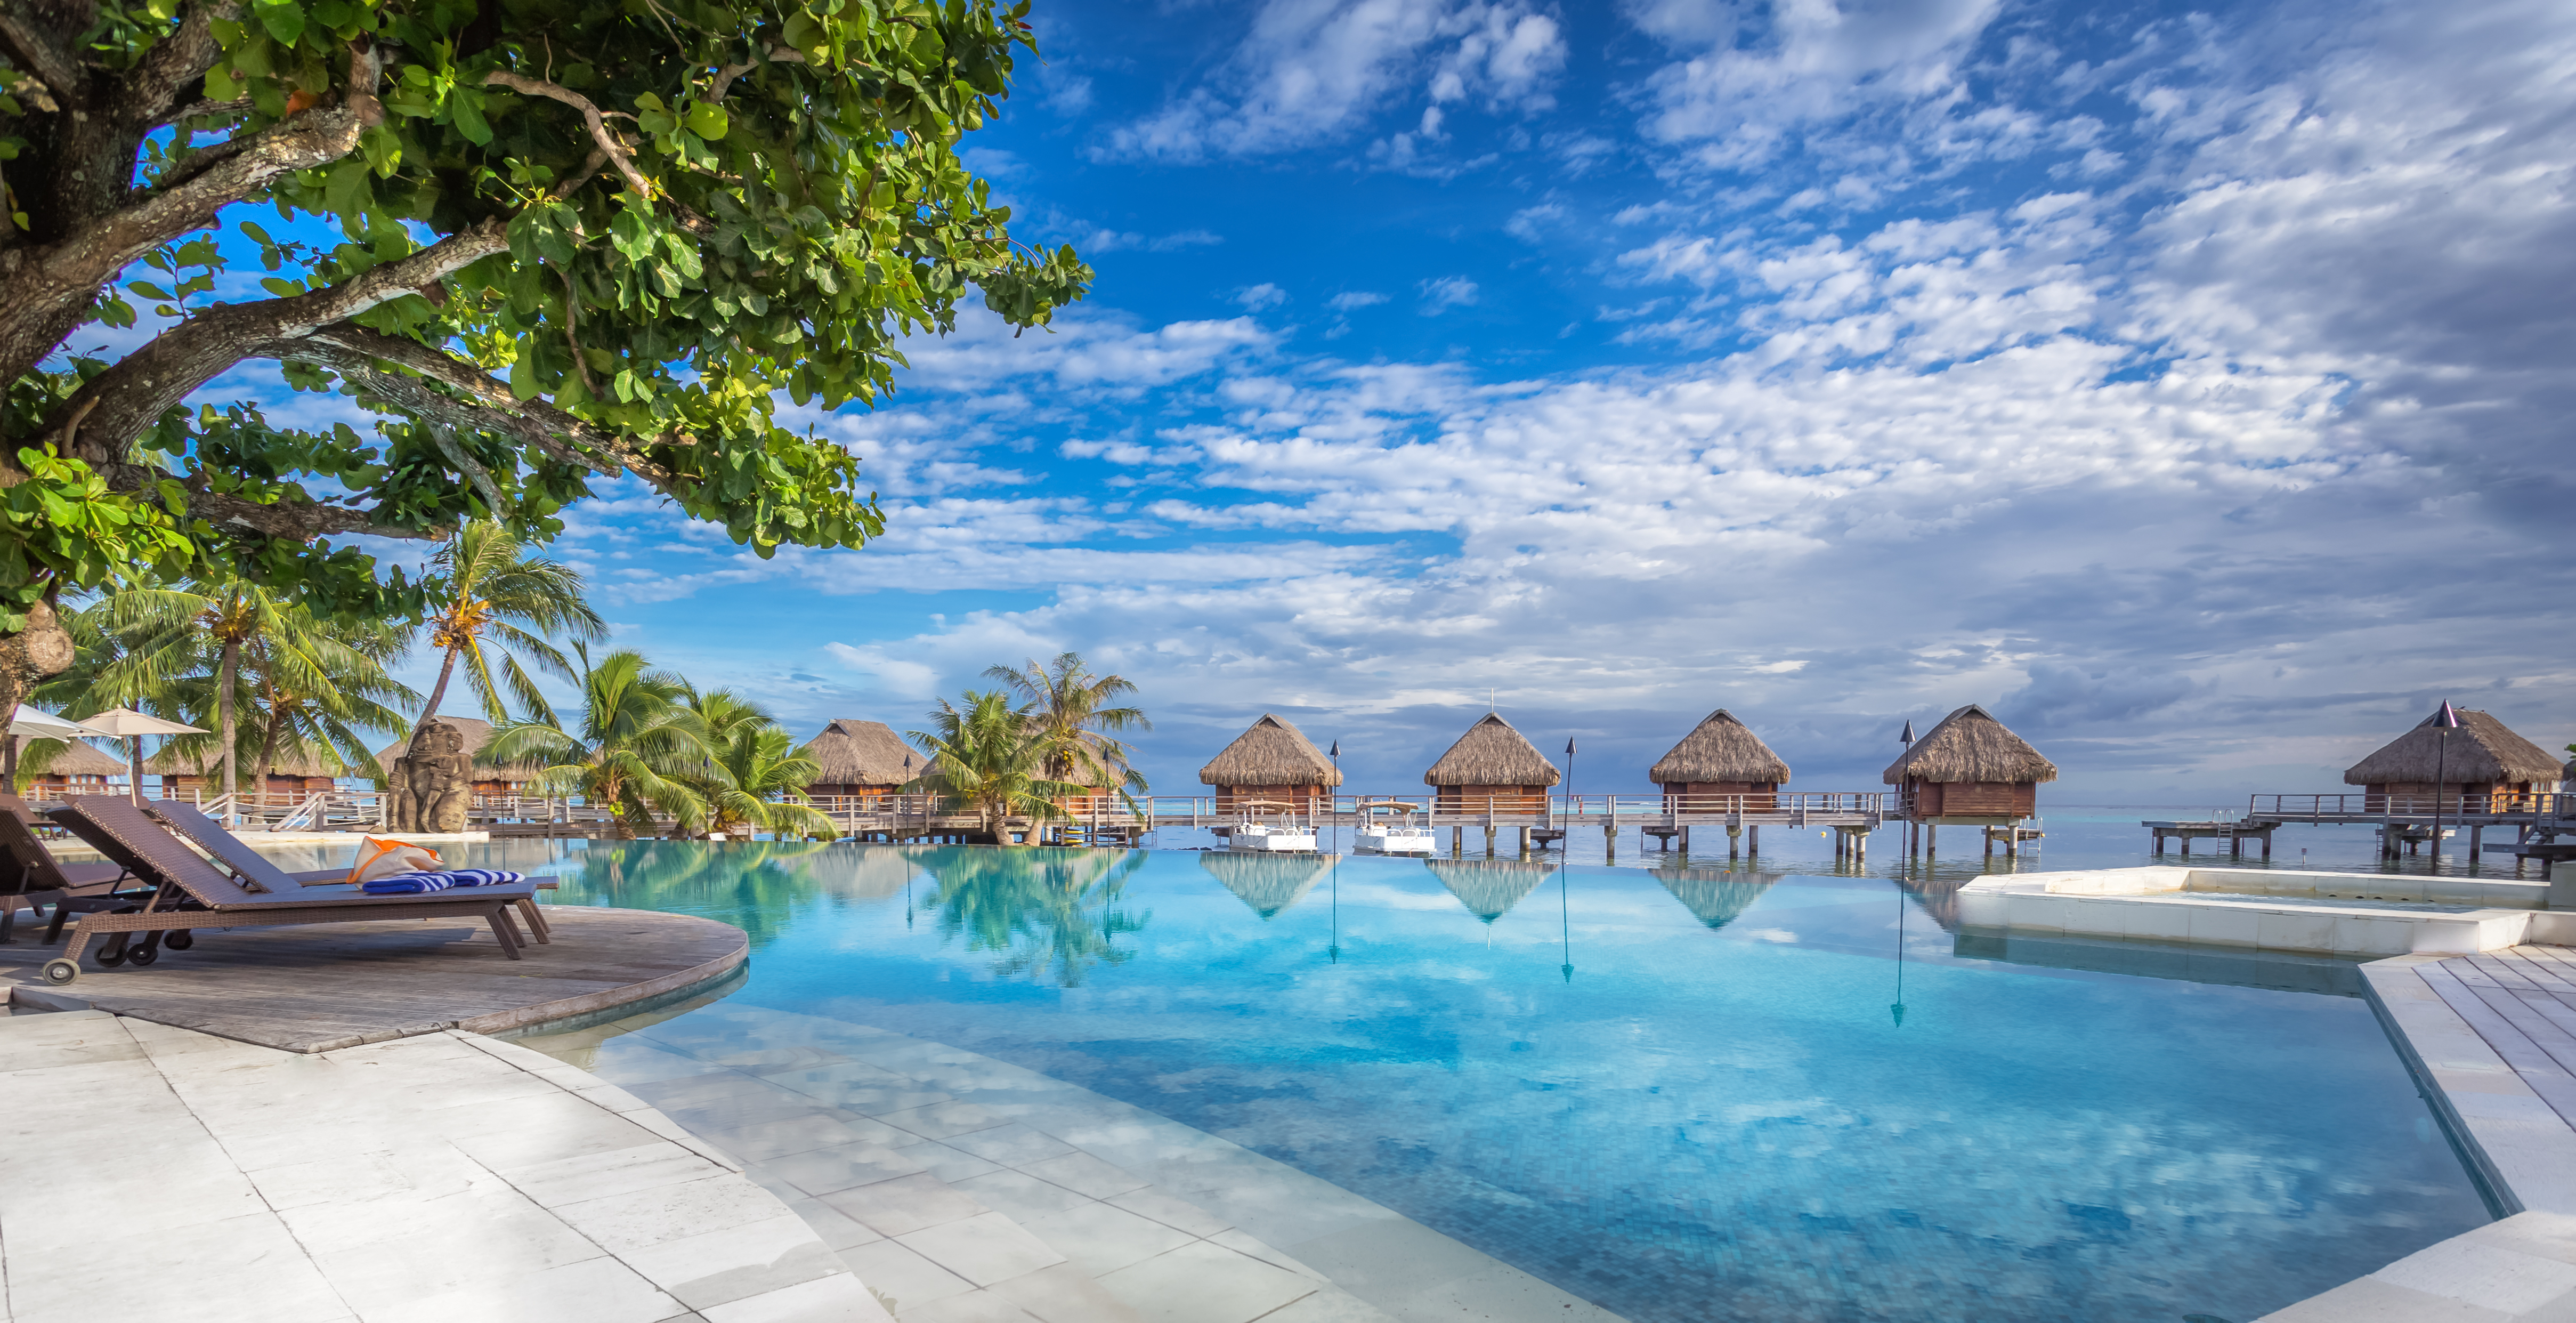 https://tahititourisme.es/wp-content/uploads/2017/08/HEBERGEMENT-Manava-Beach-Resort-and-Spa-Moorea-1-Charles_Veronese.jpg